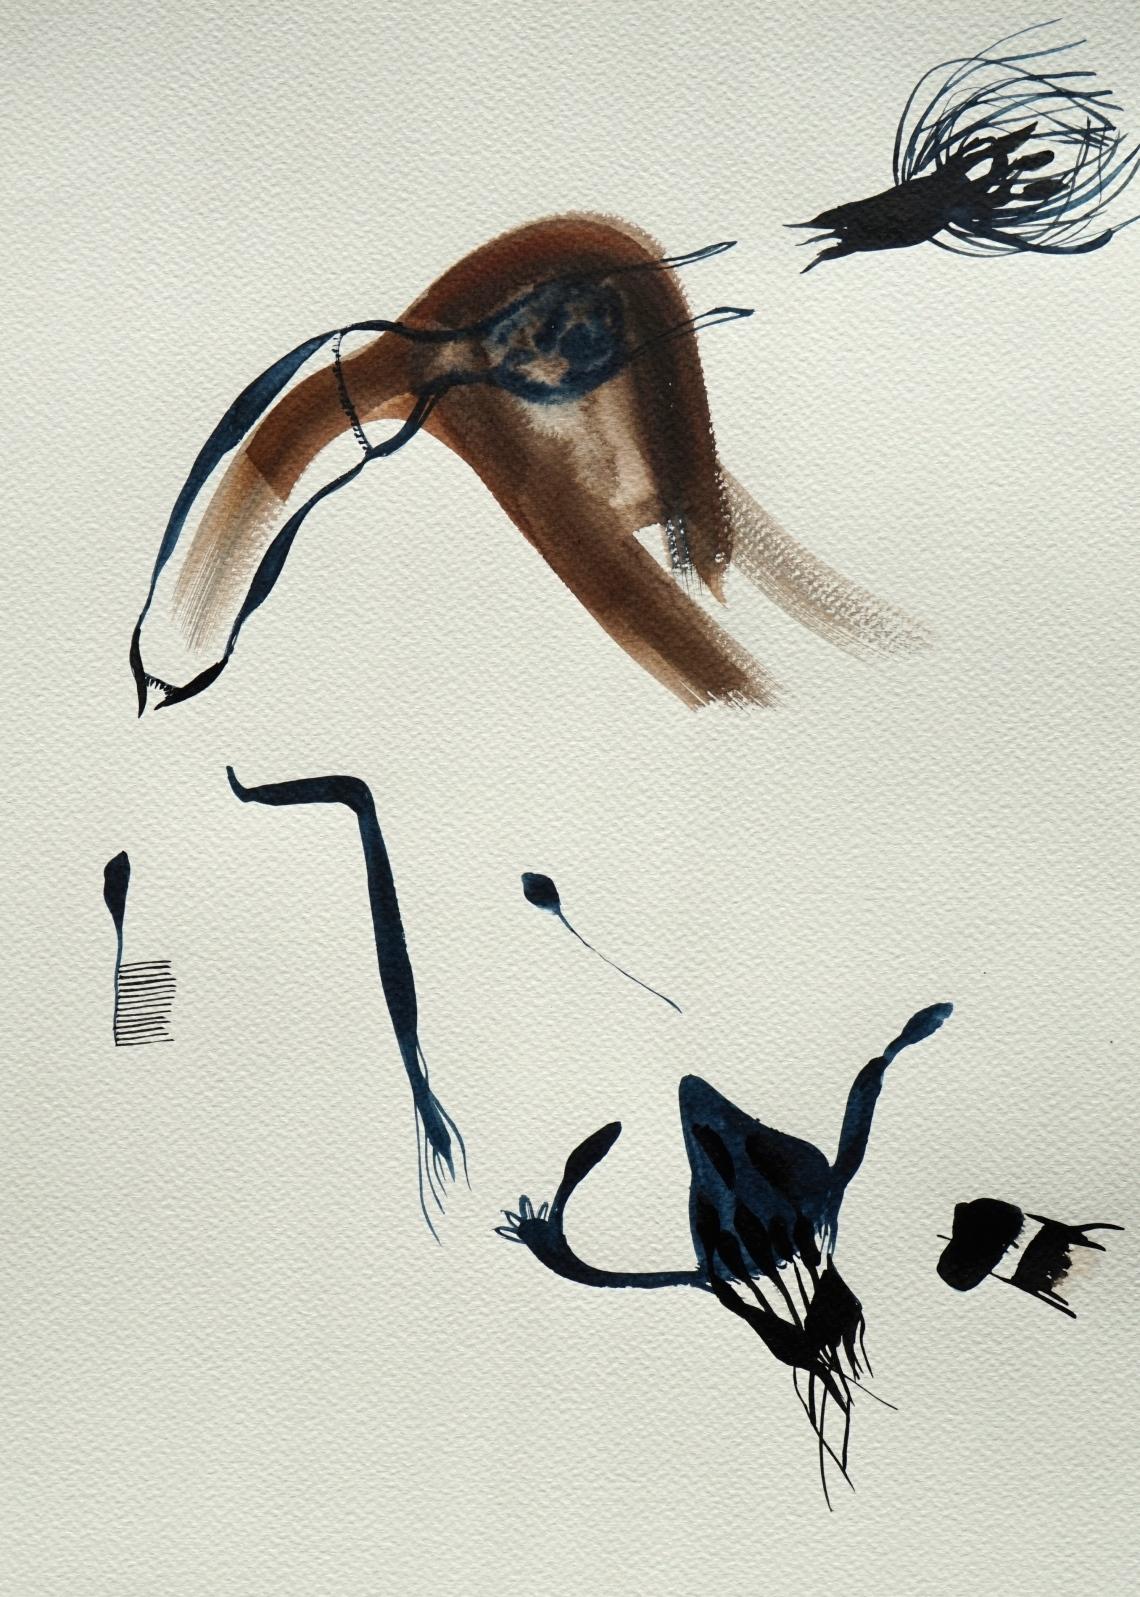 Nasty Little Creatures 4, watercolours, 30 x 40 cm, Laura Barbuto, 2014.